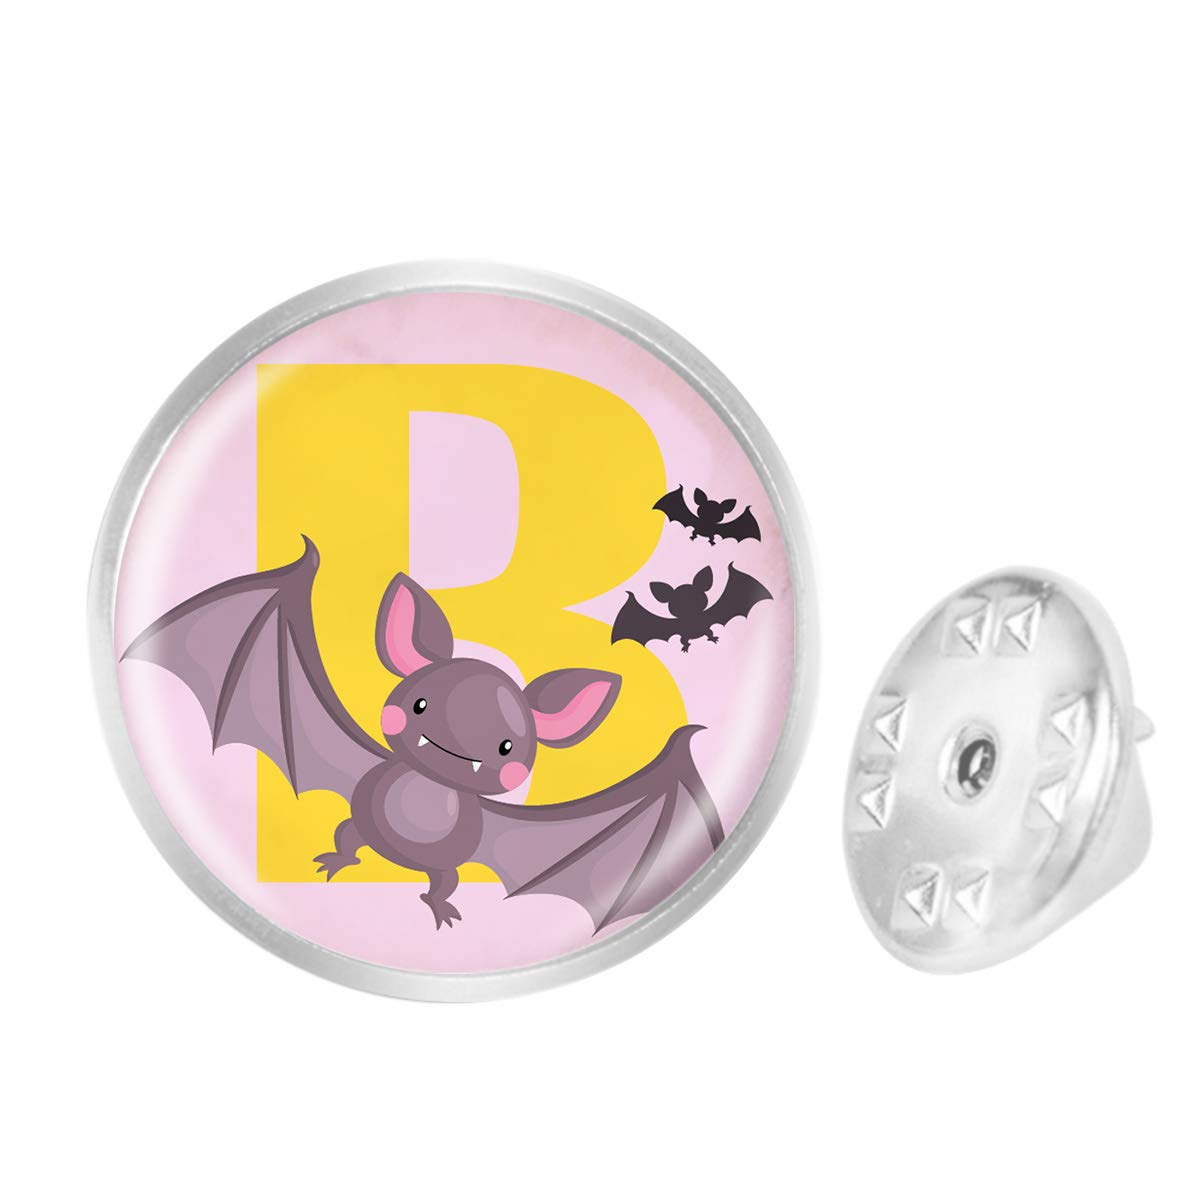 WAZZIT Round Metal Tie Tack Hat Lapel Pin Brooches Letter V Bat Banquet Badge Enamel Pins Trendy Accessory Jacket T-Shirt